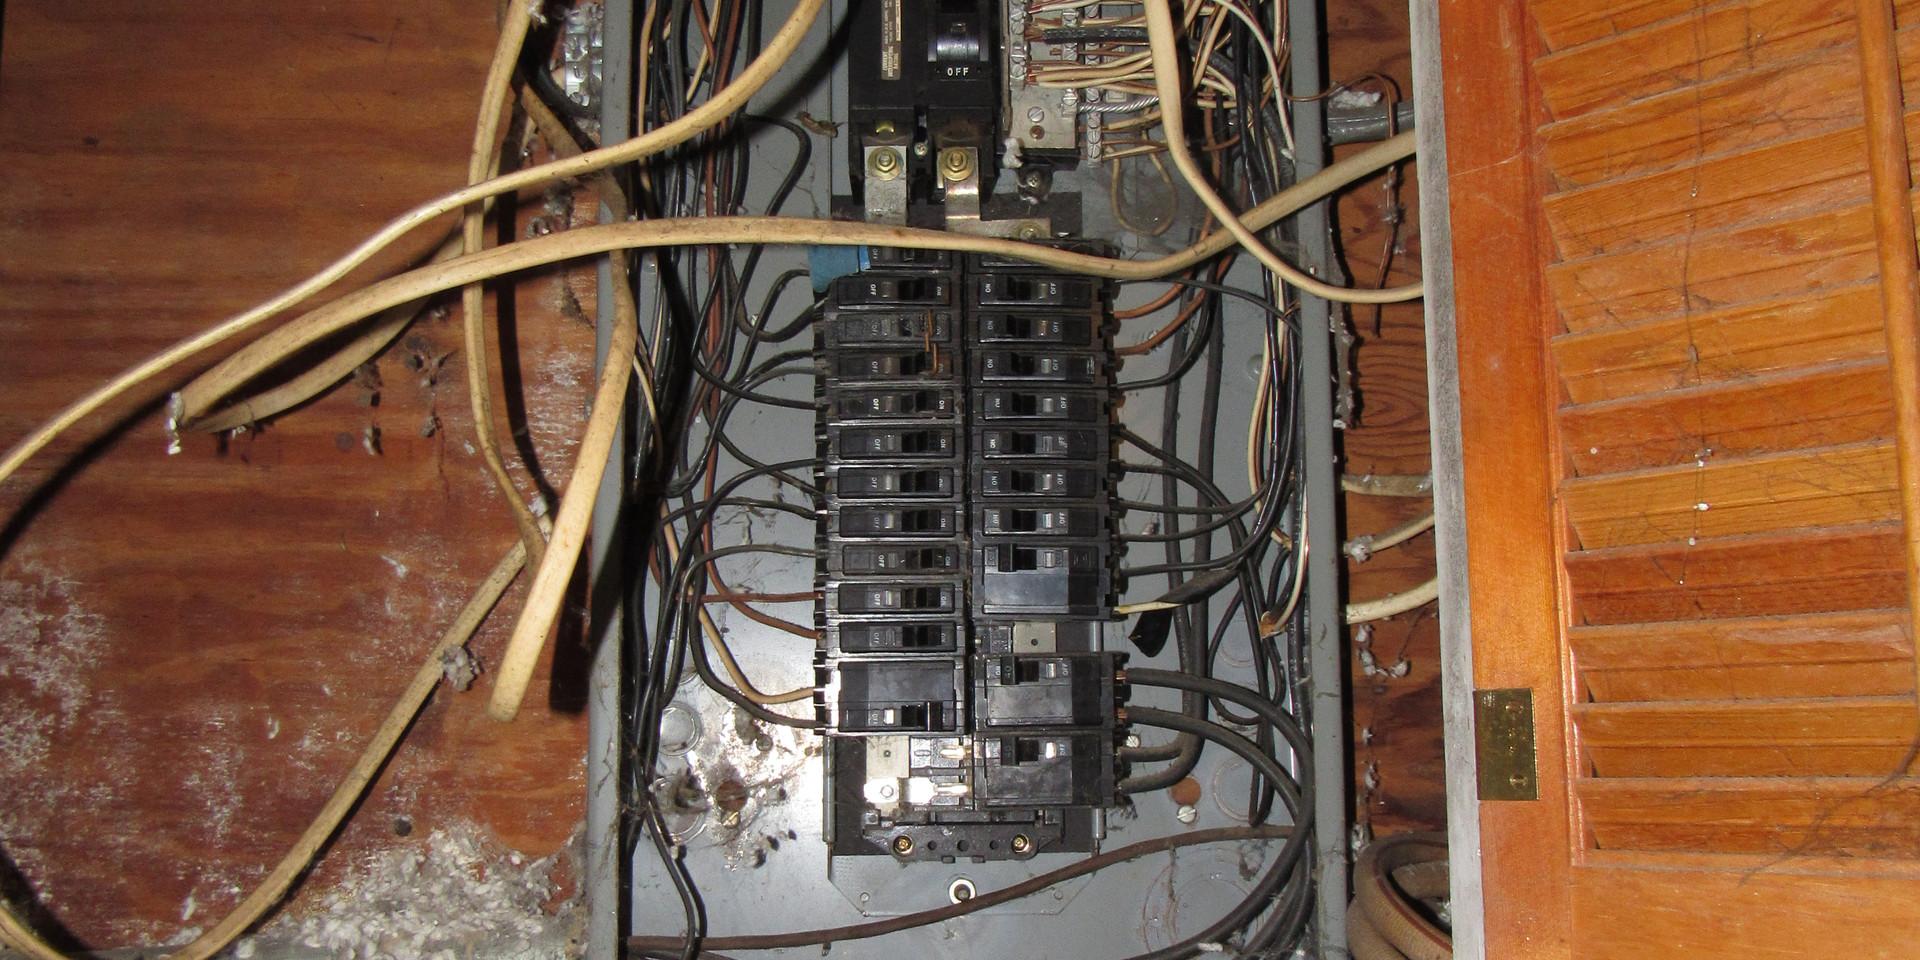 023 Electric Panel.JPG